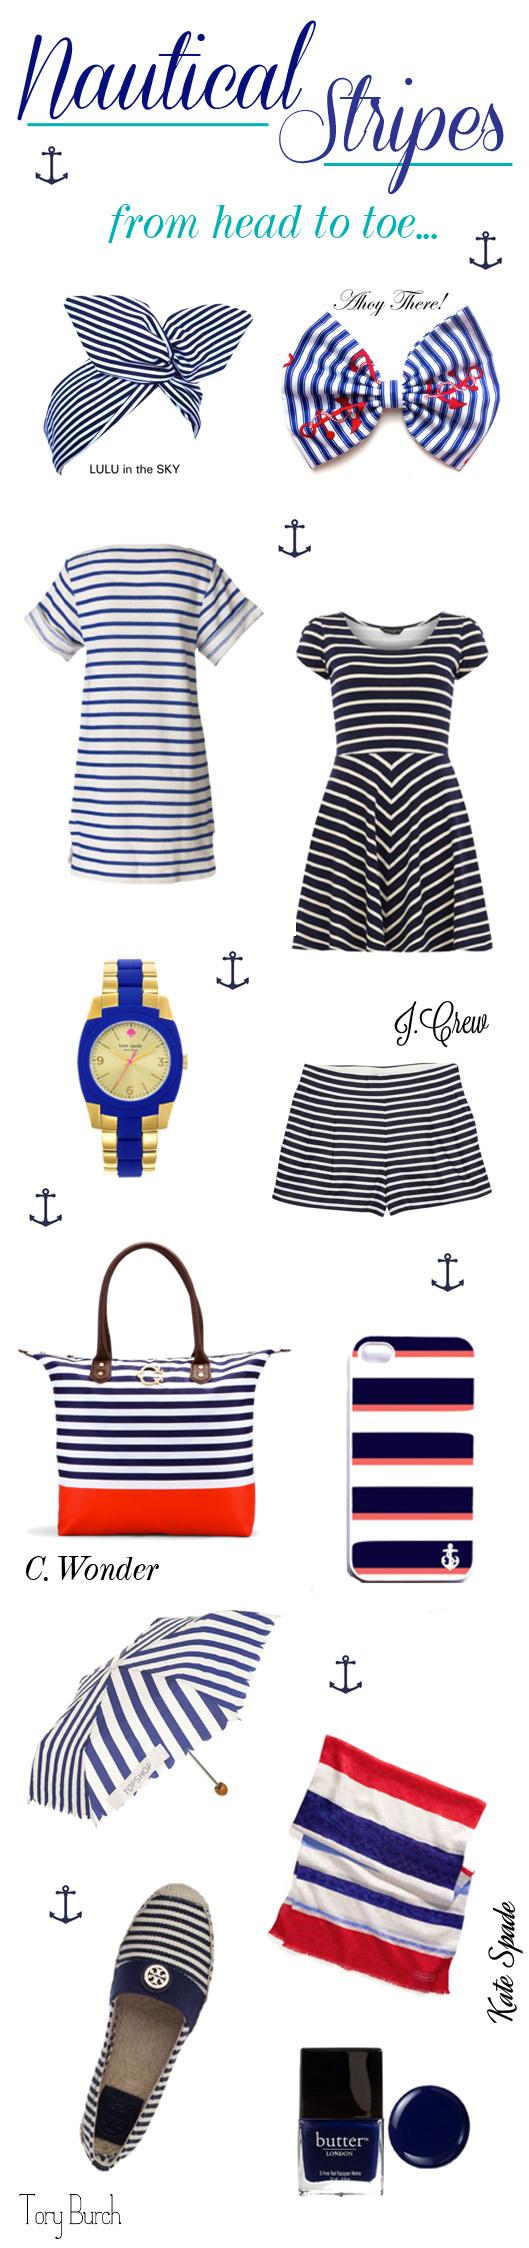 nauticalstripes